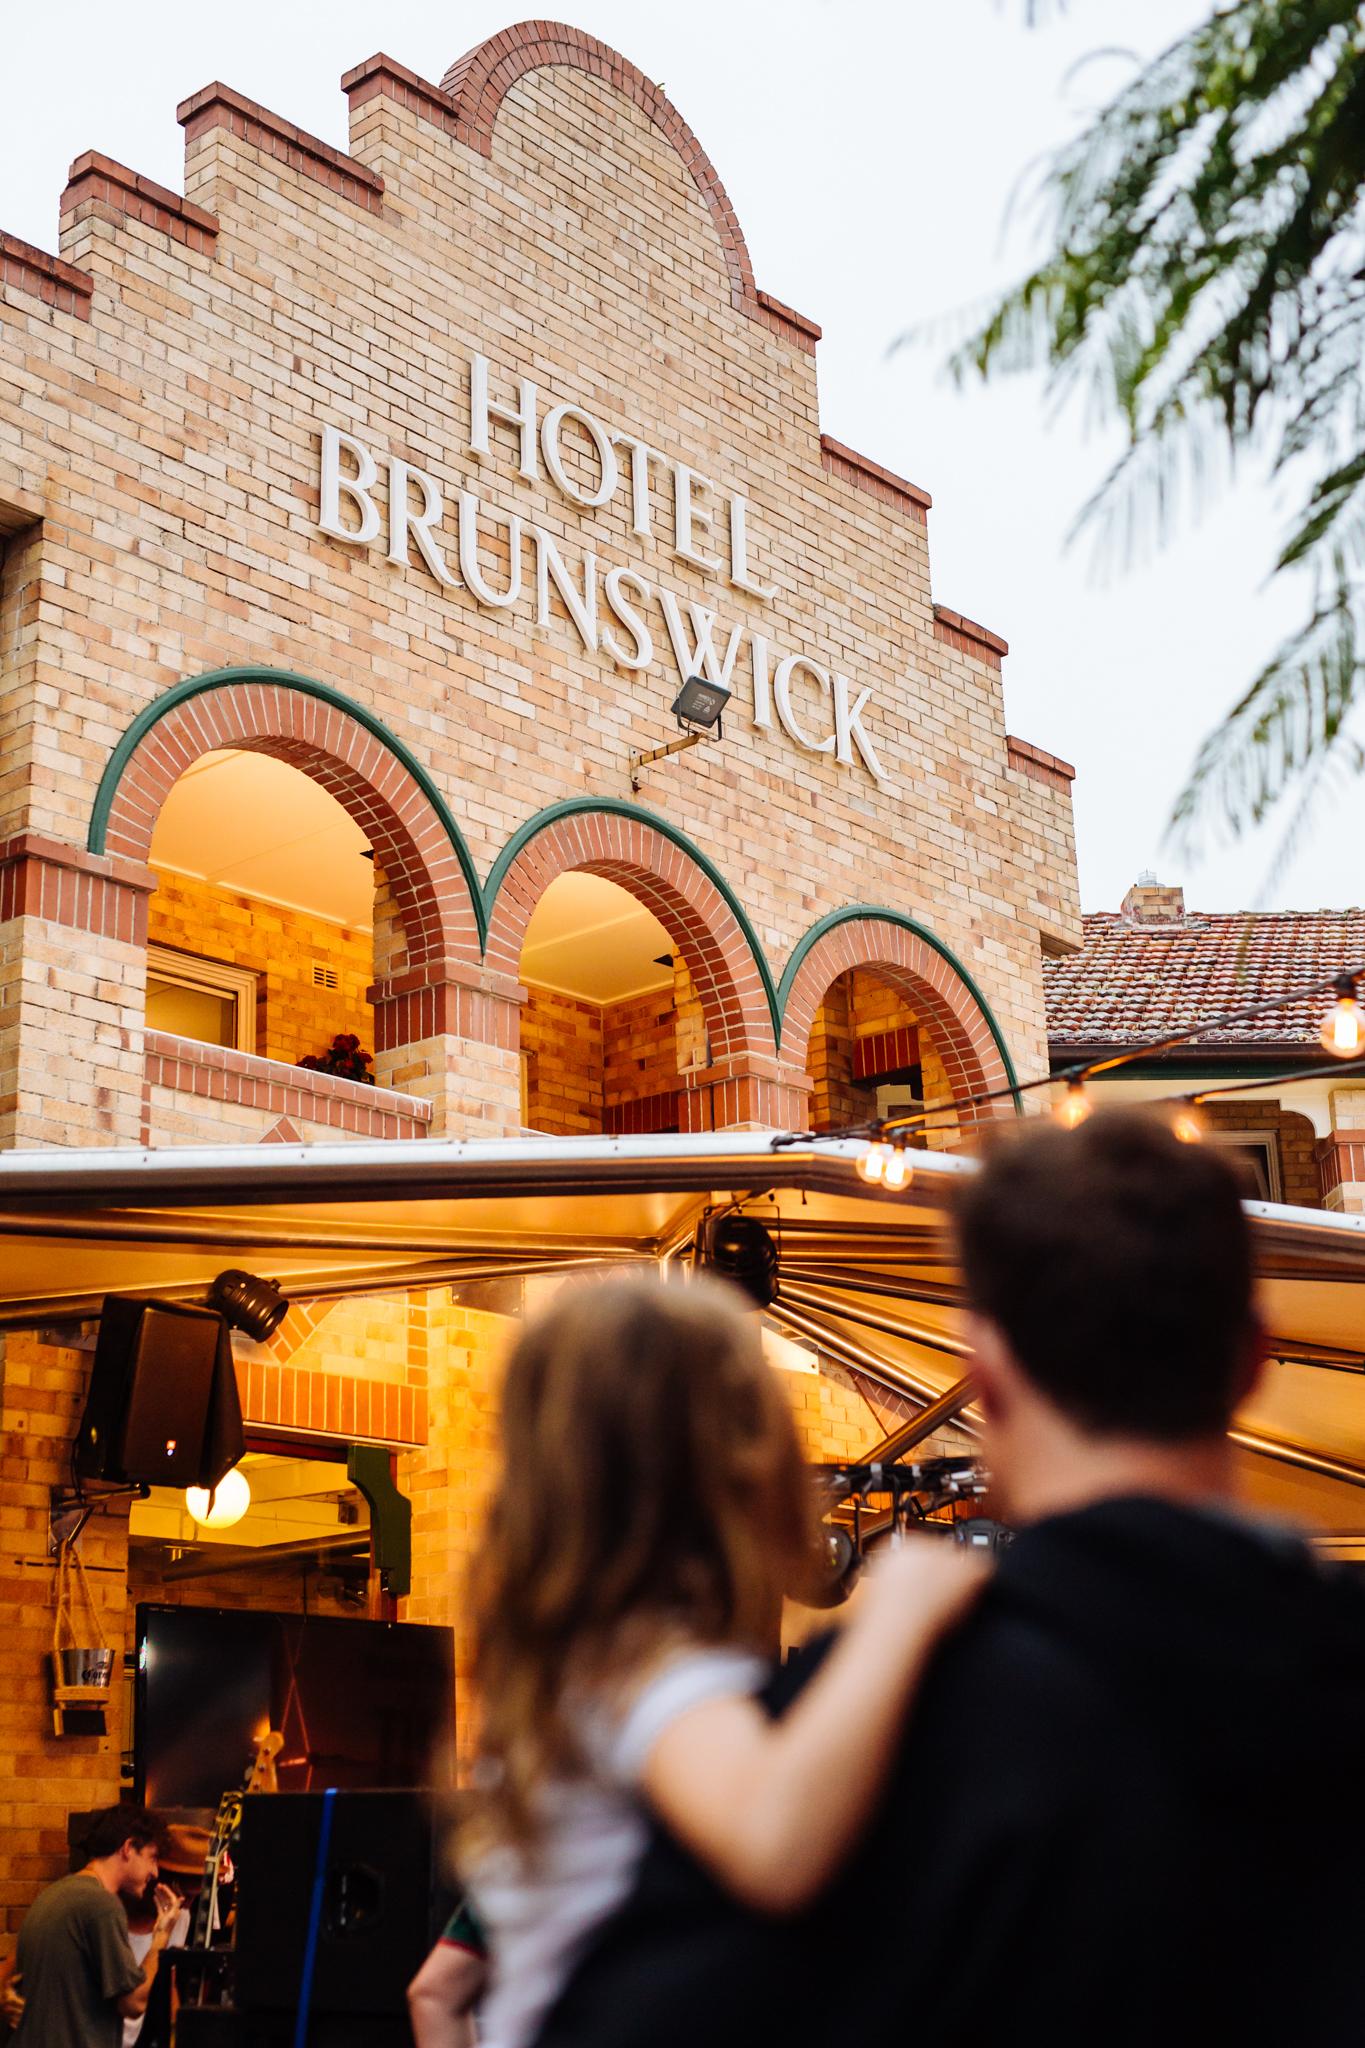 Mitch Lowe Photo - The Rubens - Hotel Brunswick-3230.jpg